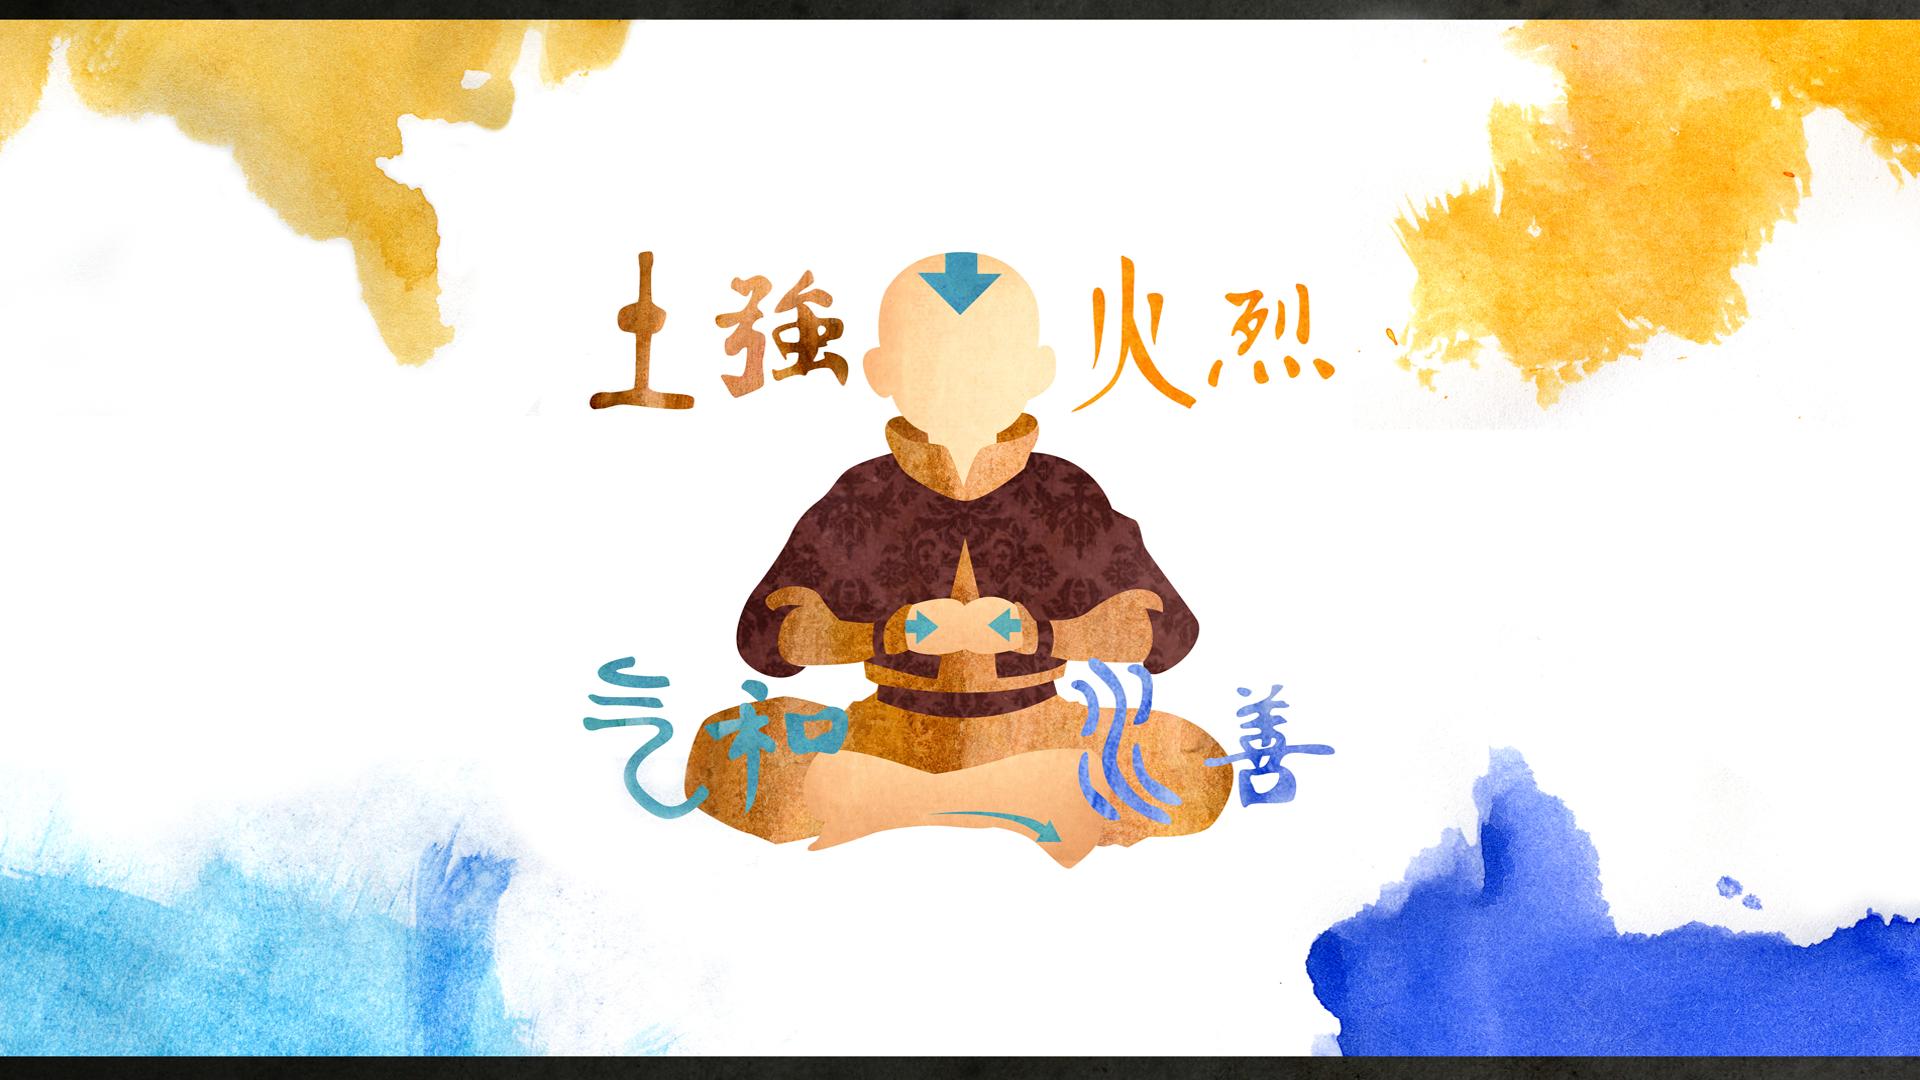 Avatar: The Legend Of Korra Full HD Wallpaper and